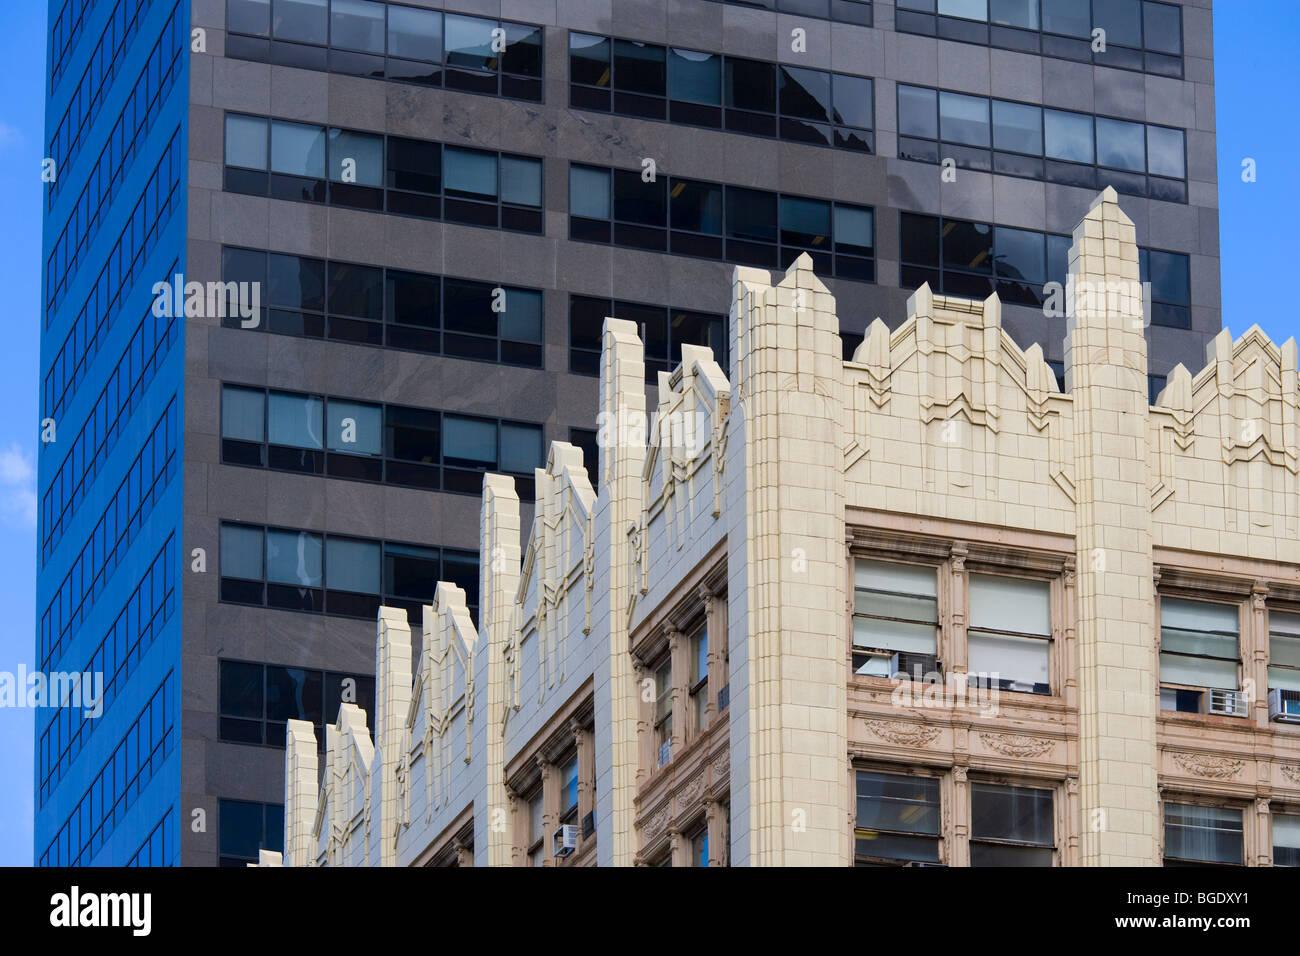 Denver Colorado. Contrast between old and new Art Deco